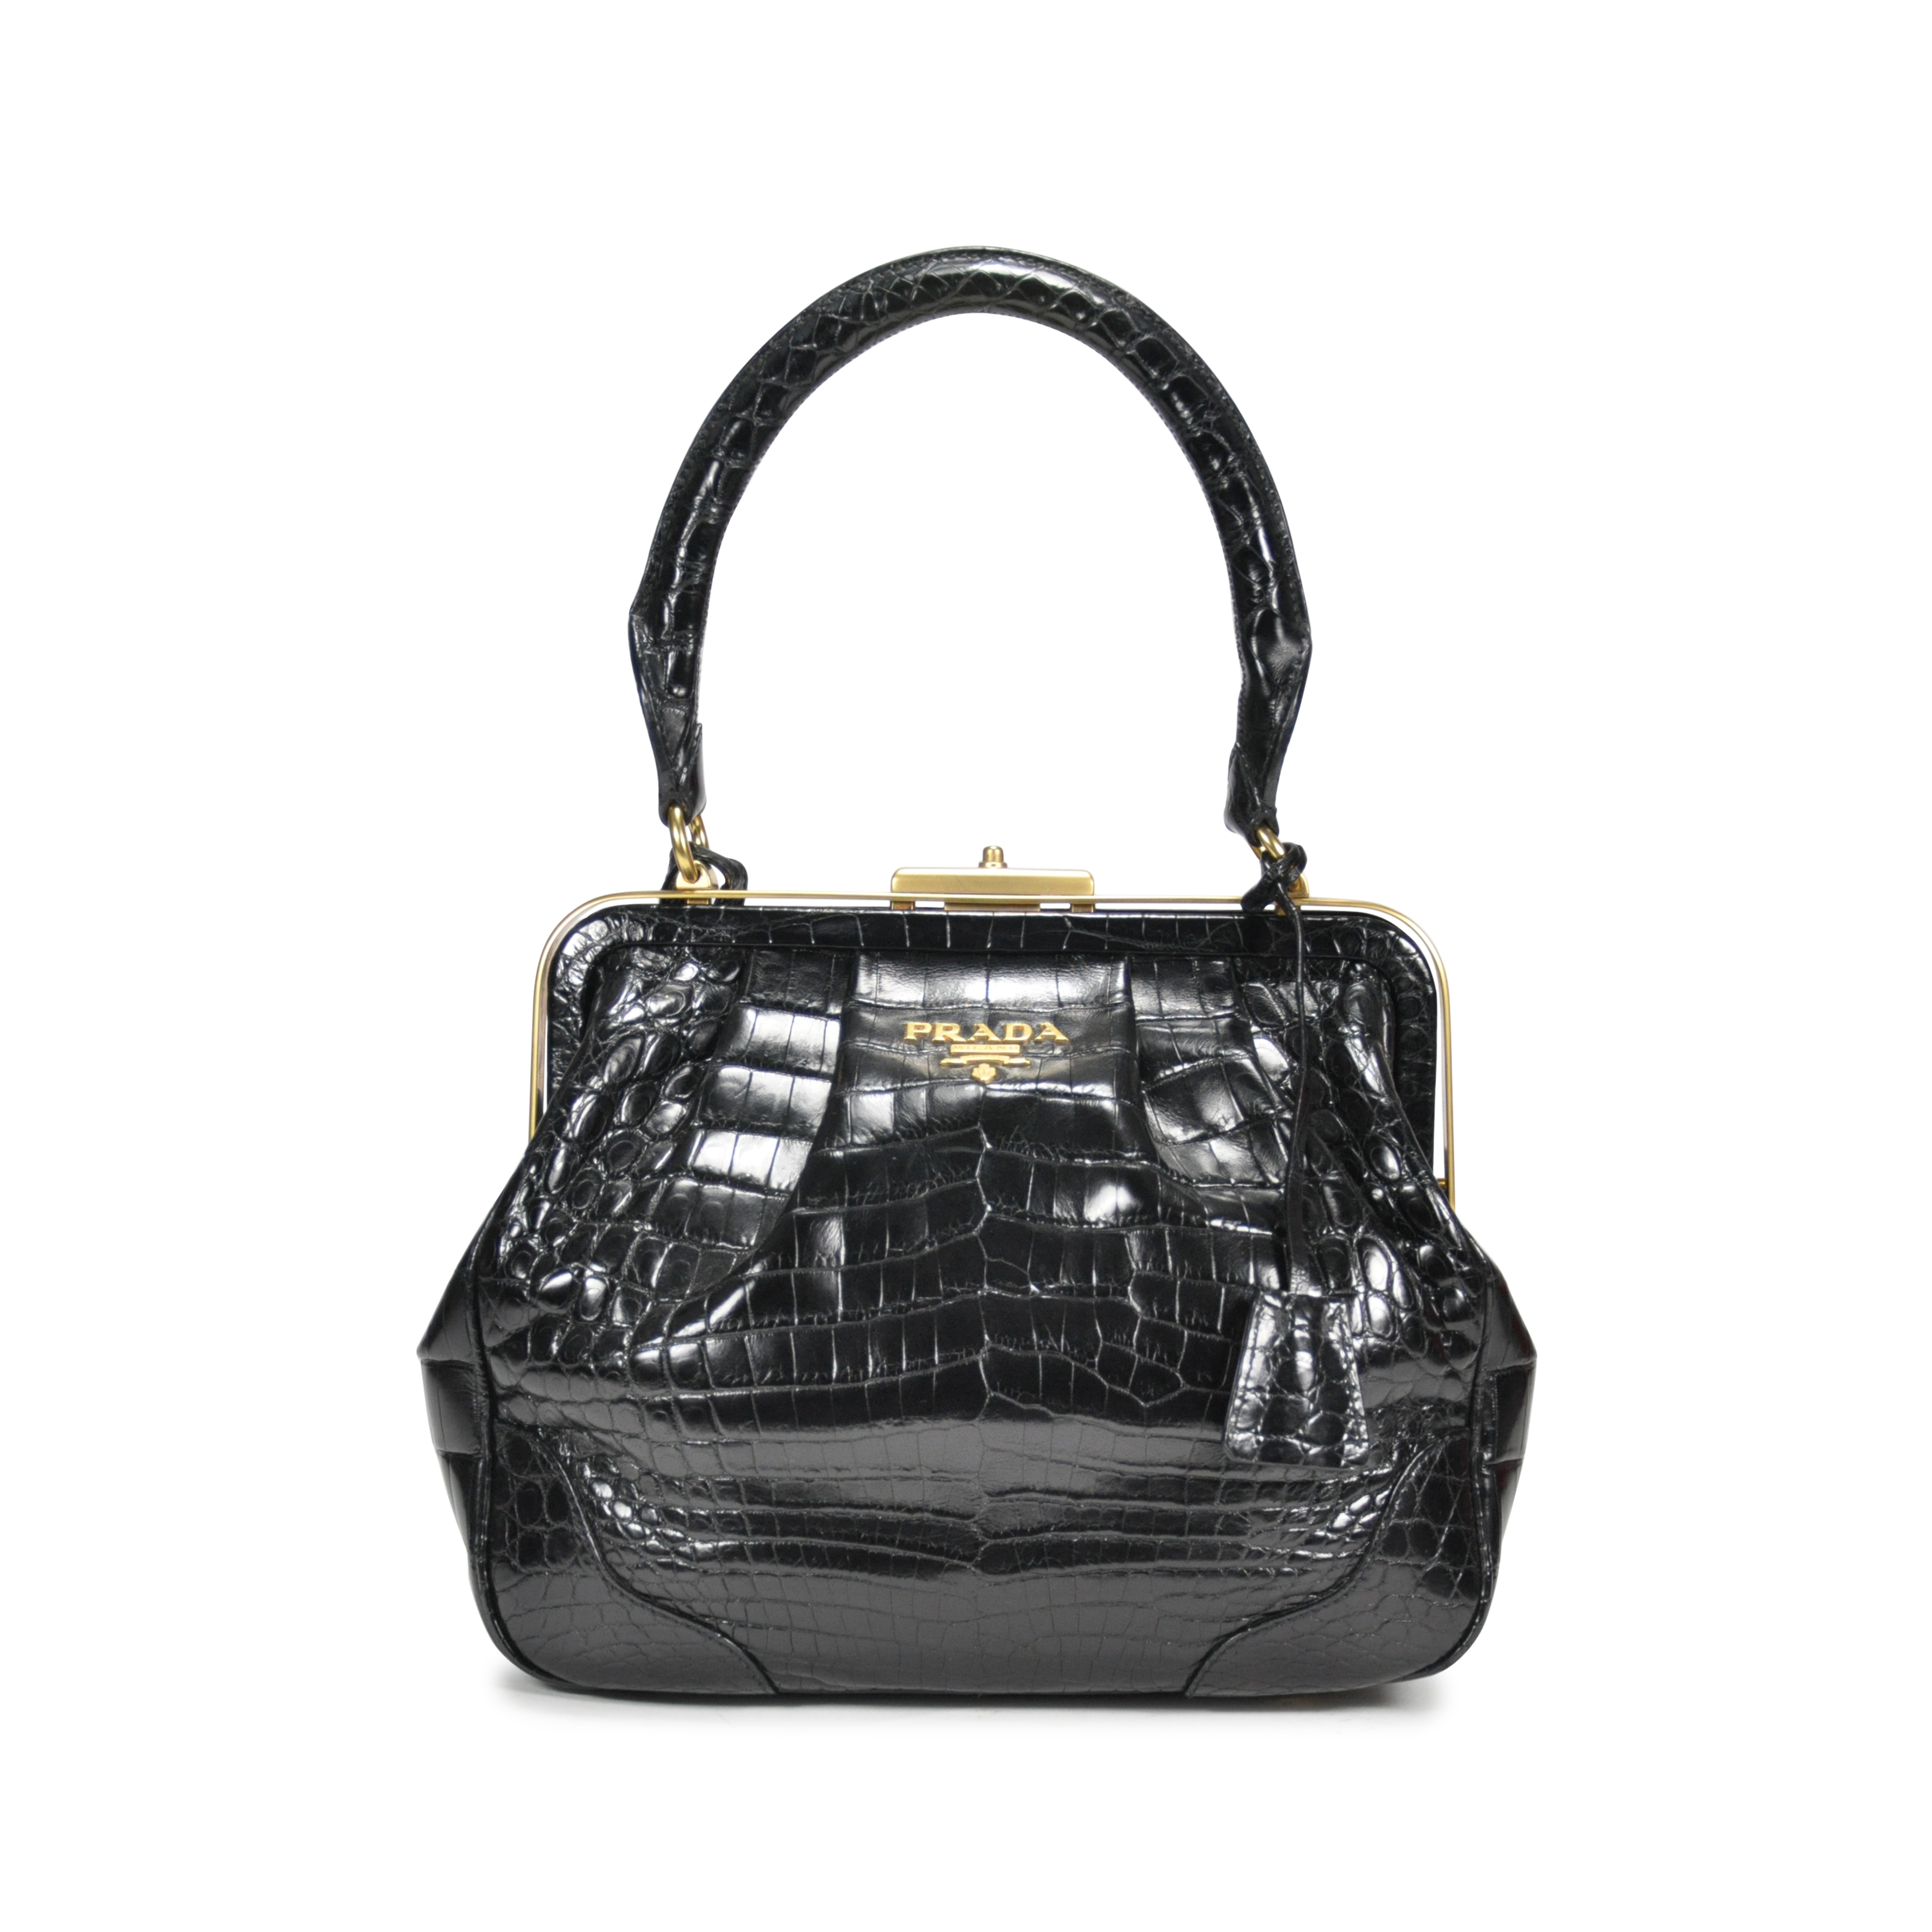 c7e89a4fab19 Authentic Second Hand Prada Crocodile Top Handle Frame Bag (PSS-145-00076)